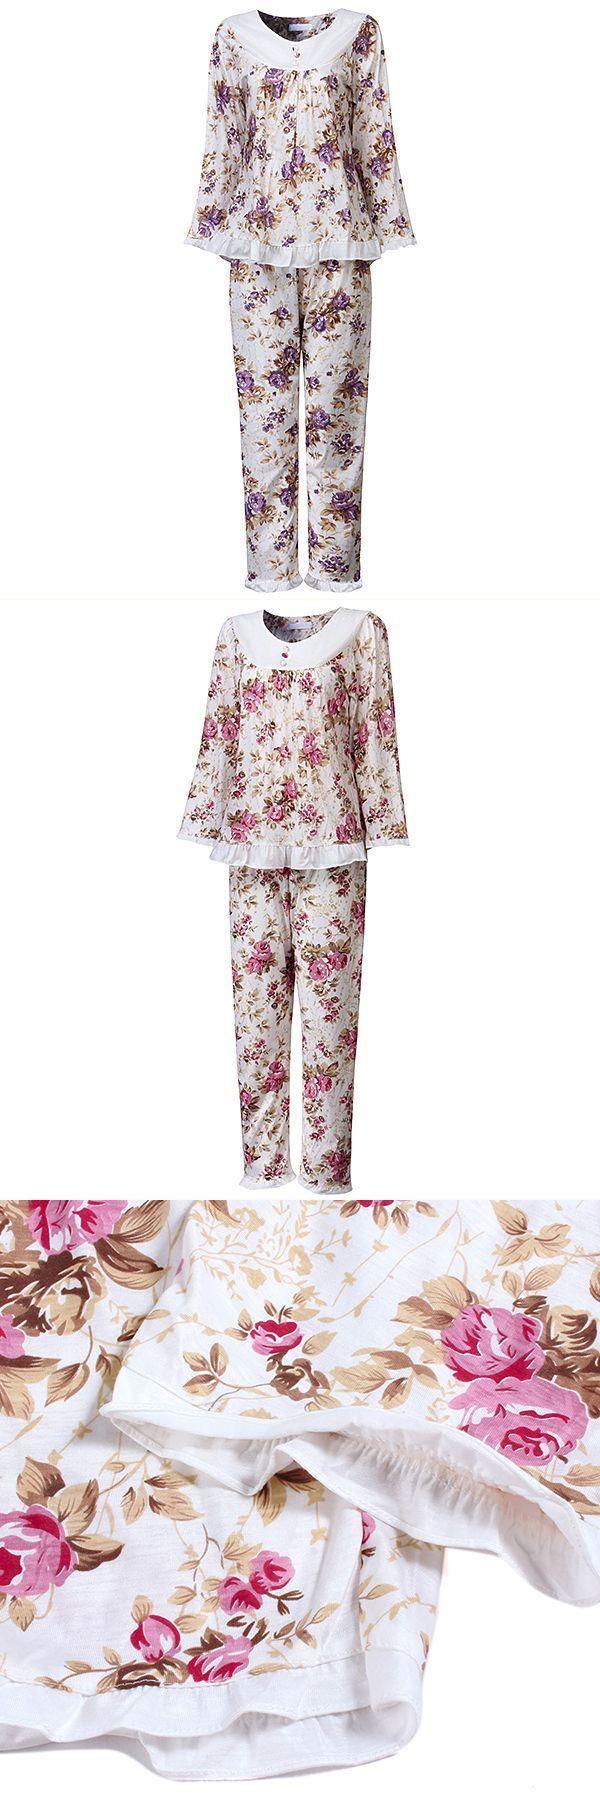 934b147763 Plus size floral printing cotton nightwear soft long sleeve pajamas sets  for women dillards sleepwear robes  dkny  sleepwear  robes  izod  s…